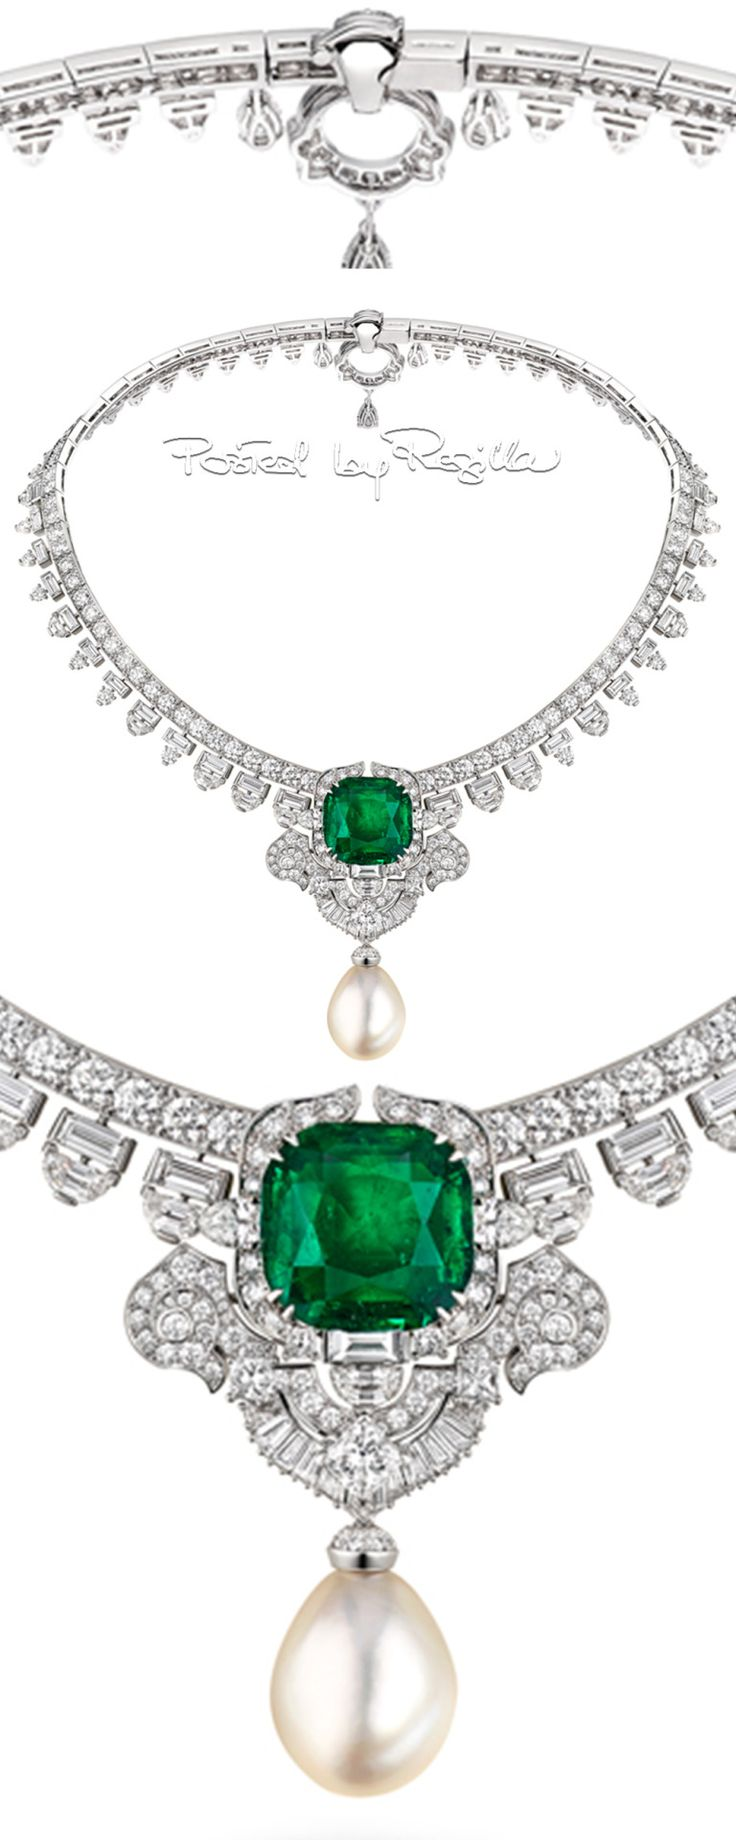 Regilla van cleef arpels jewellery sketchesjewelry drawingcrystal